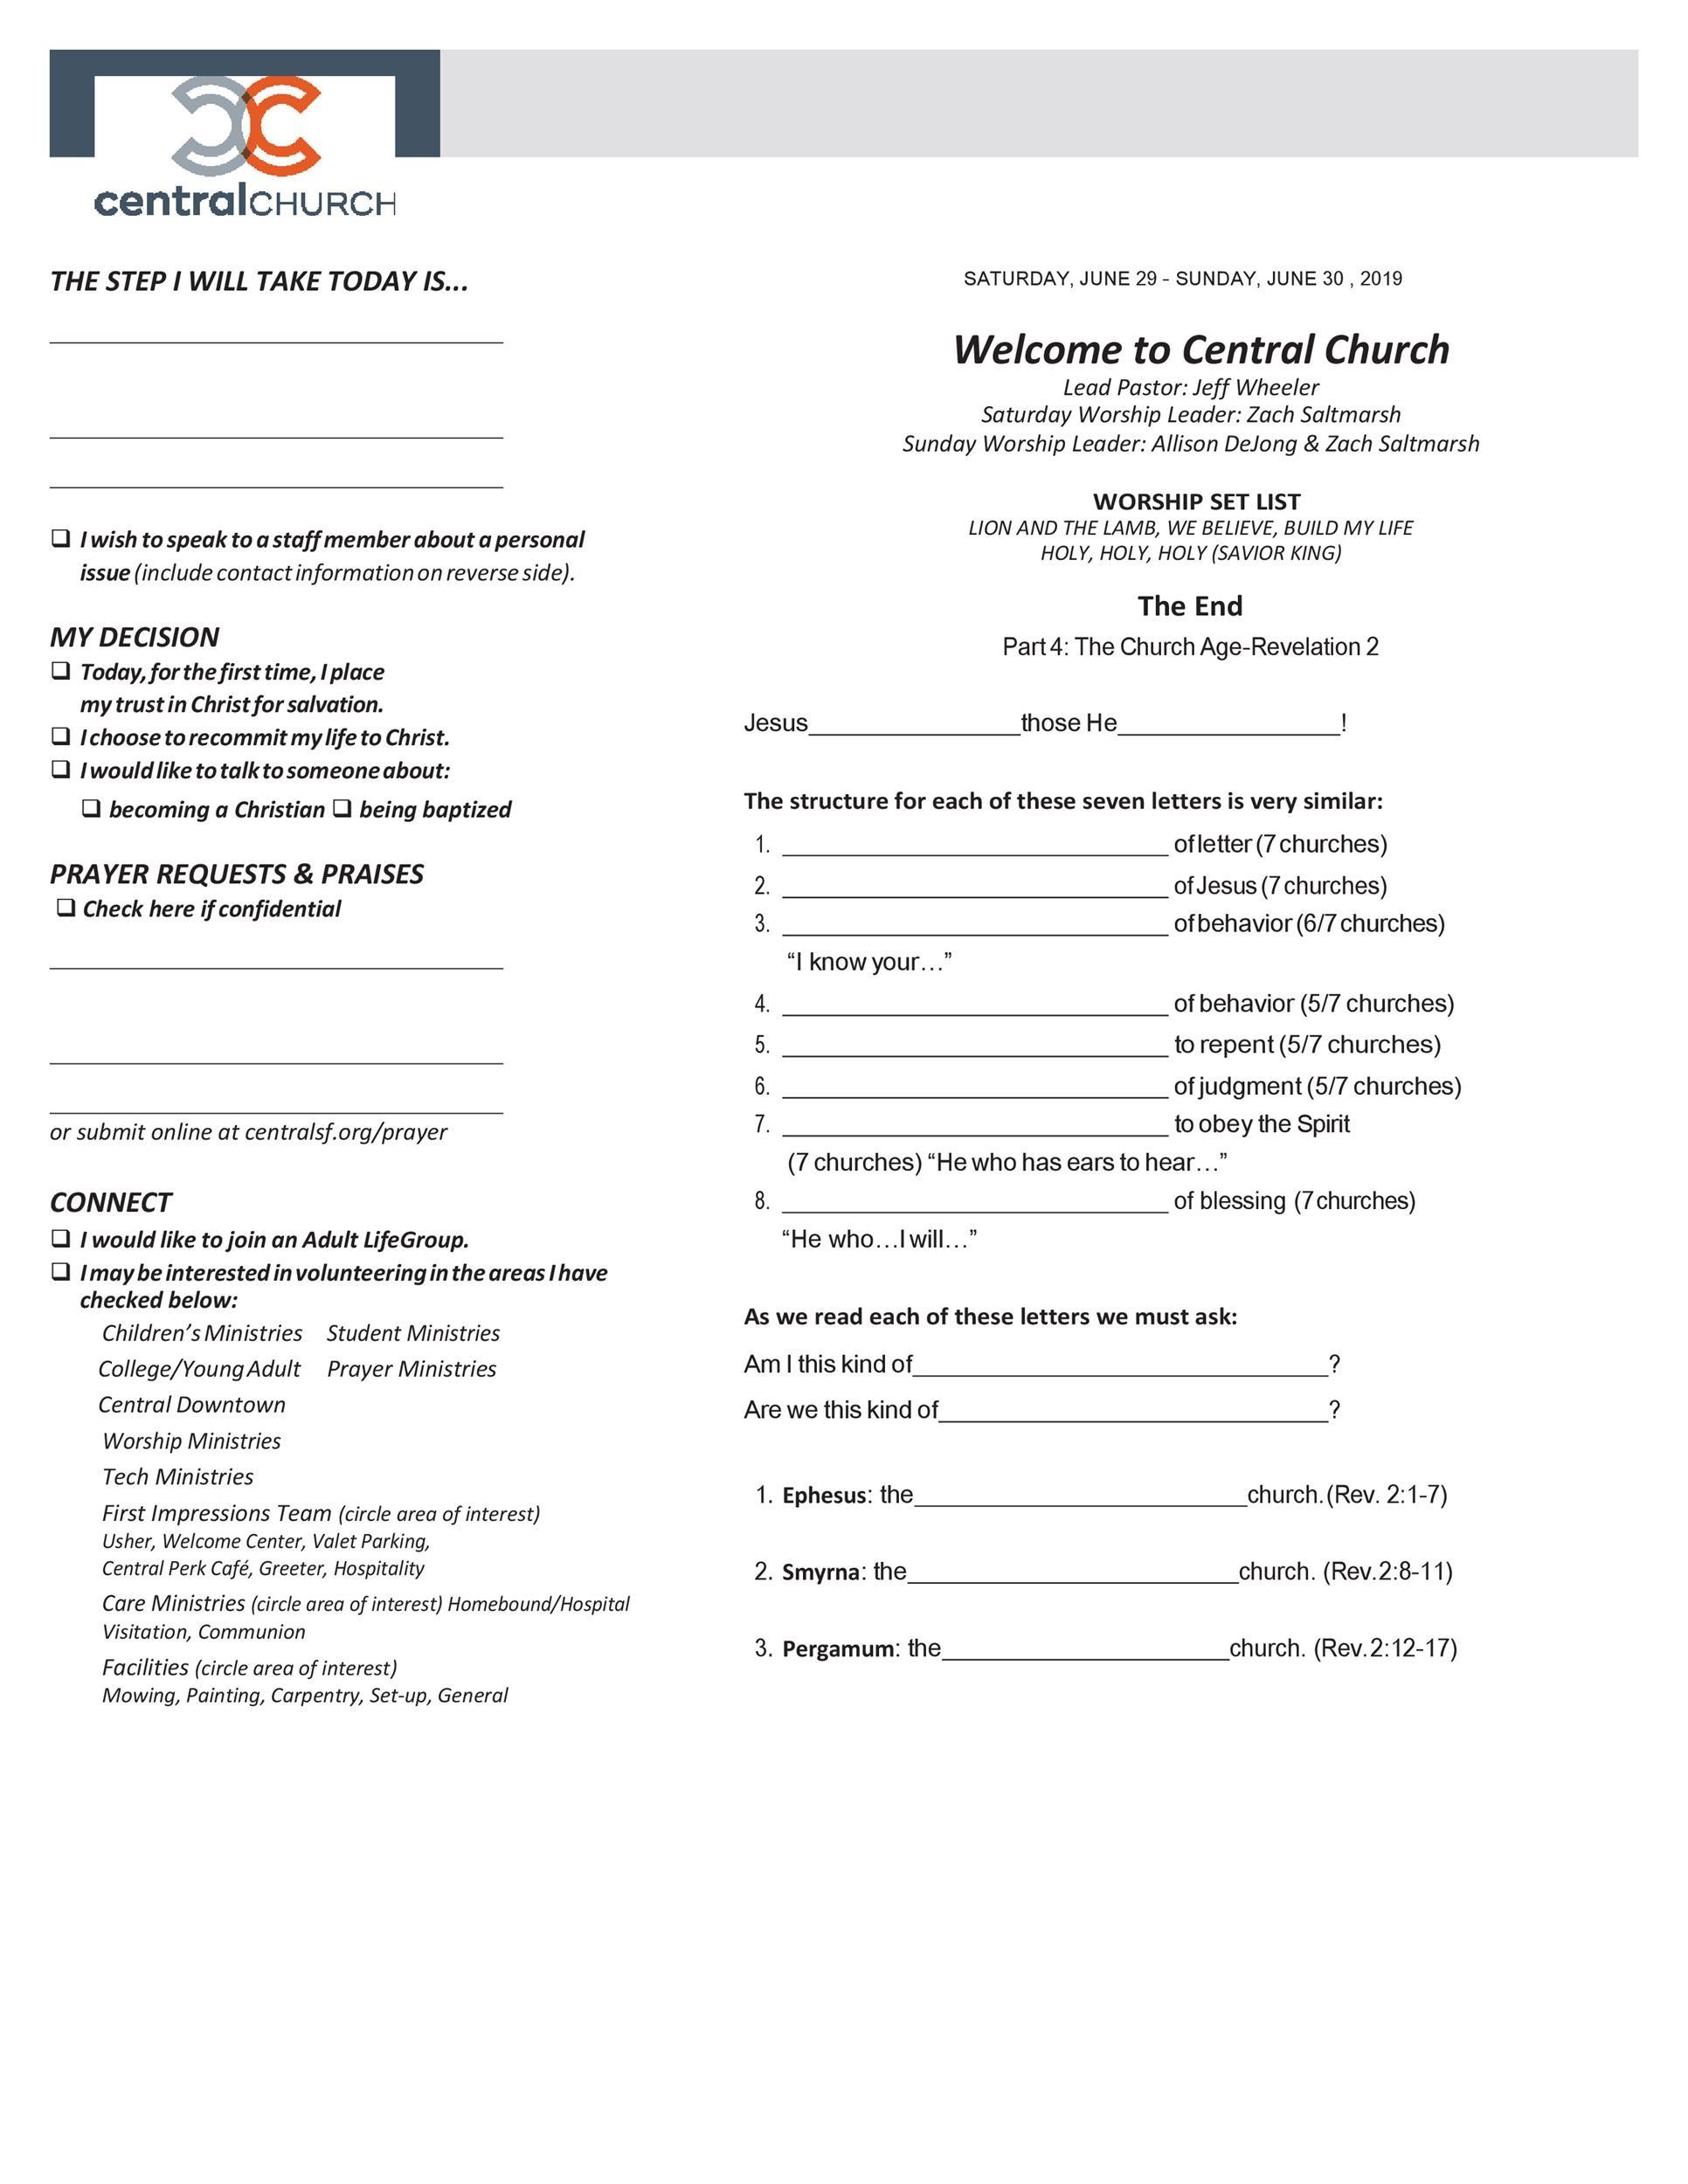 Free church bulletin templates 25